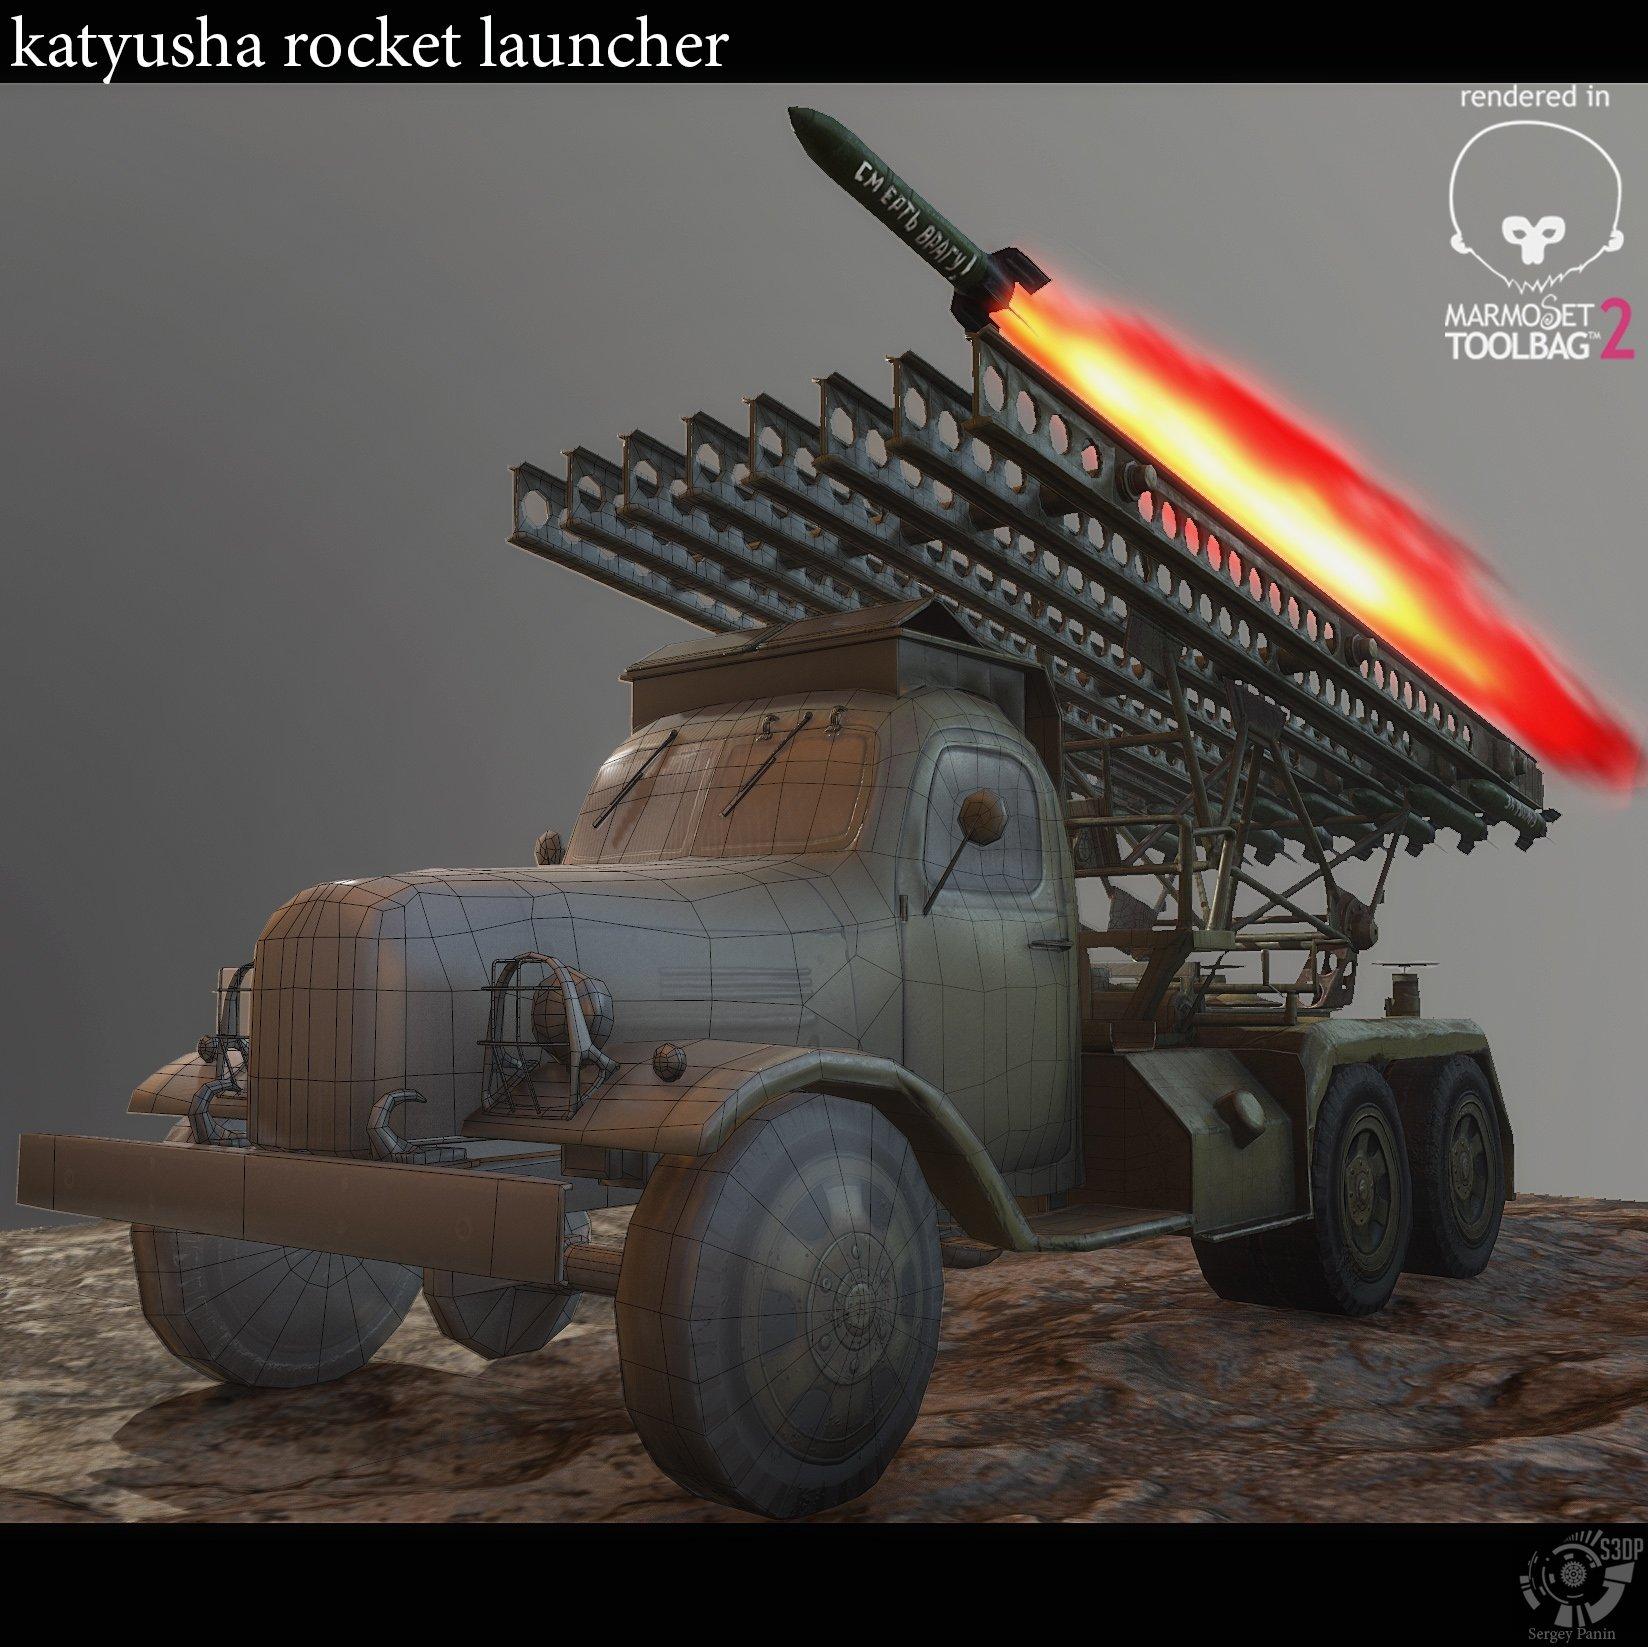 World War Rocket Launcher - katyusha (USSR) — polycount